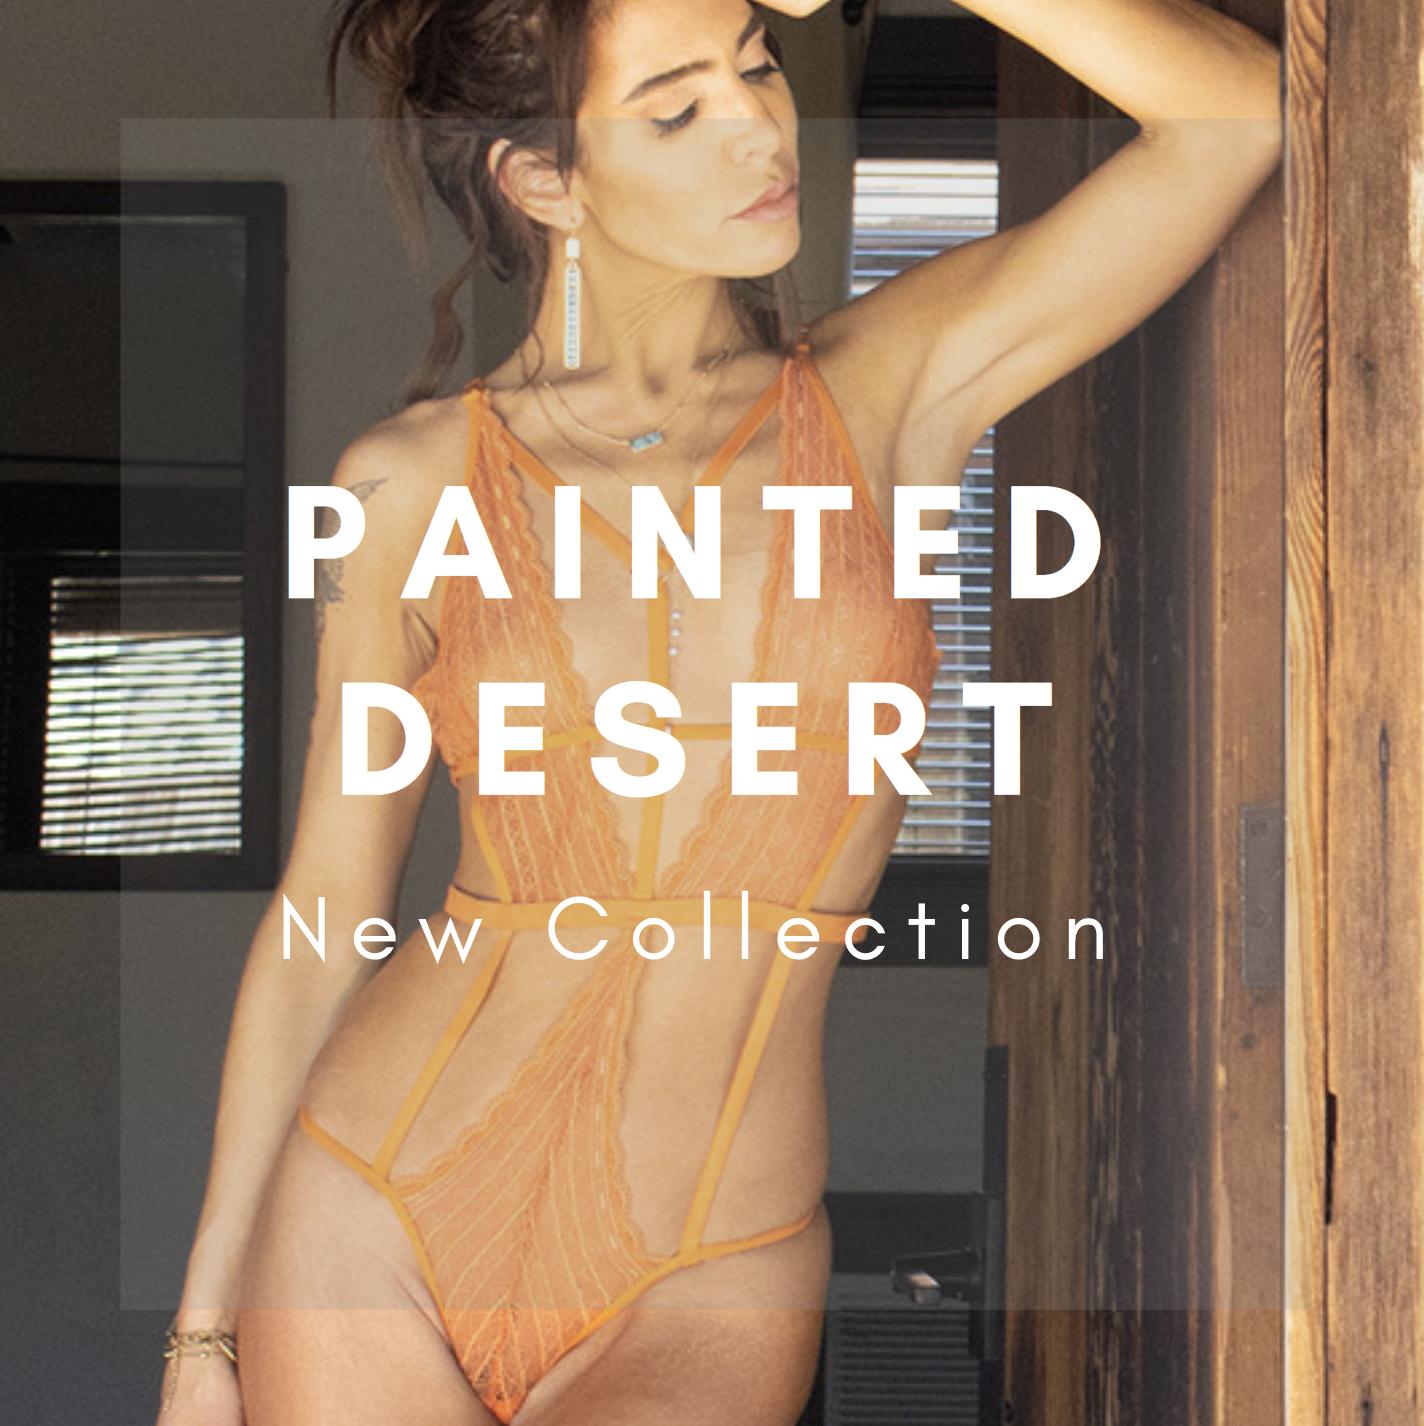 lingerie, teddy, bodysuit, sexy, orange, fall, summer, garter, luxury, chic, vacation, resort,  boho